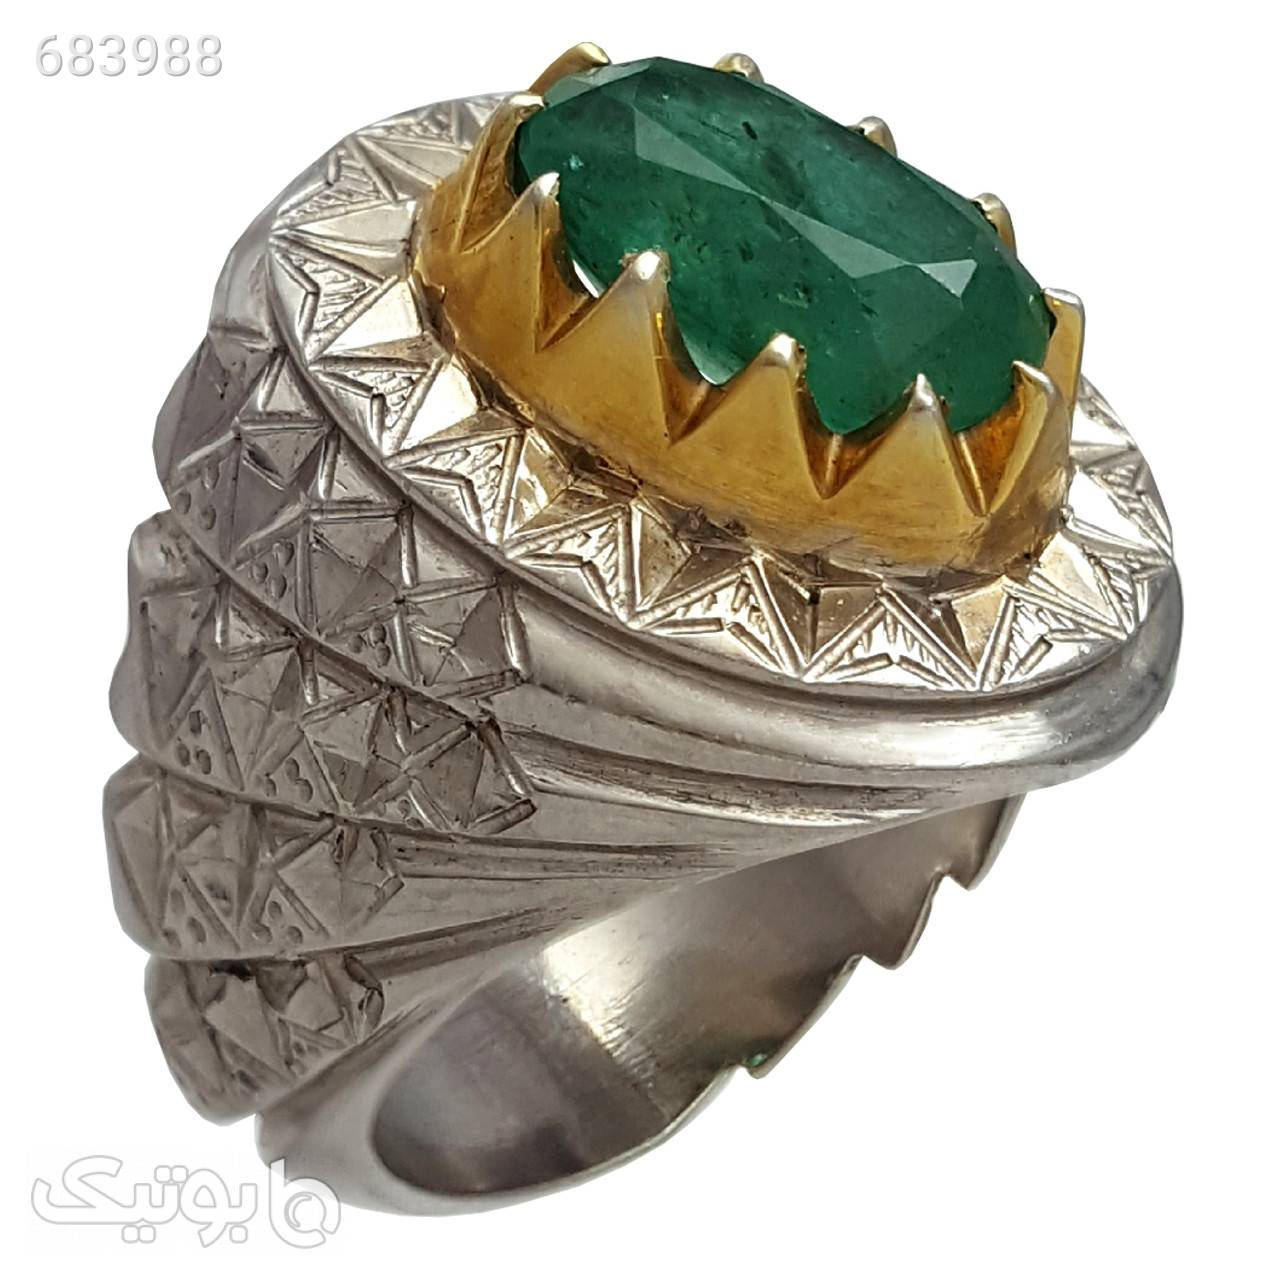 انگشتر نقره مردانه مدل a566jw نقره ای انگشتر